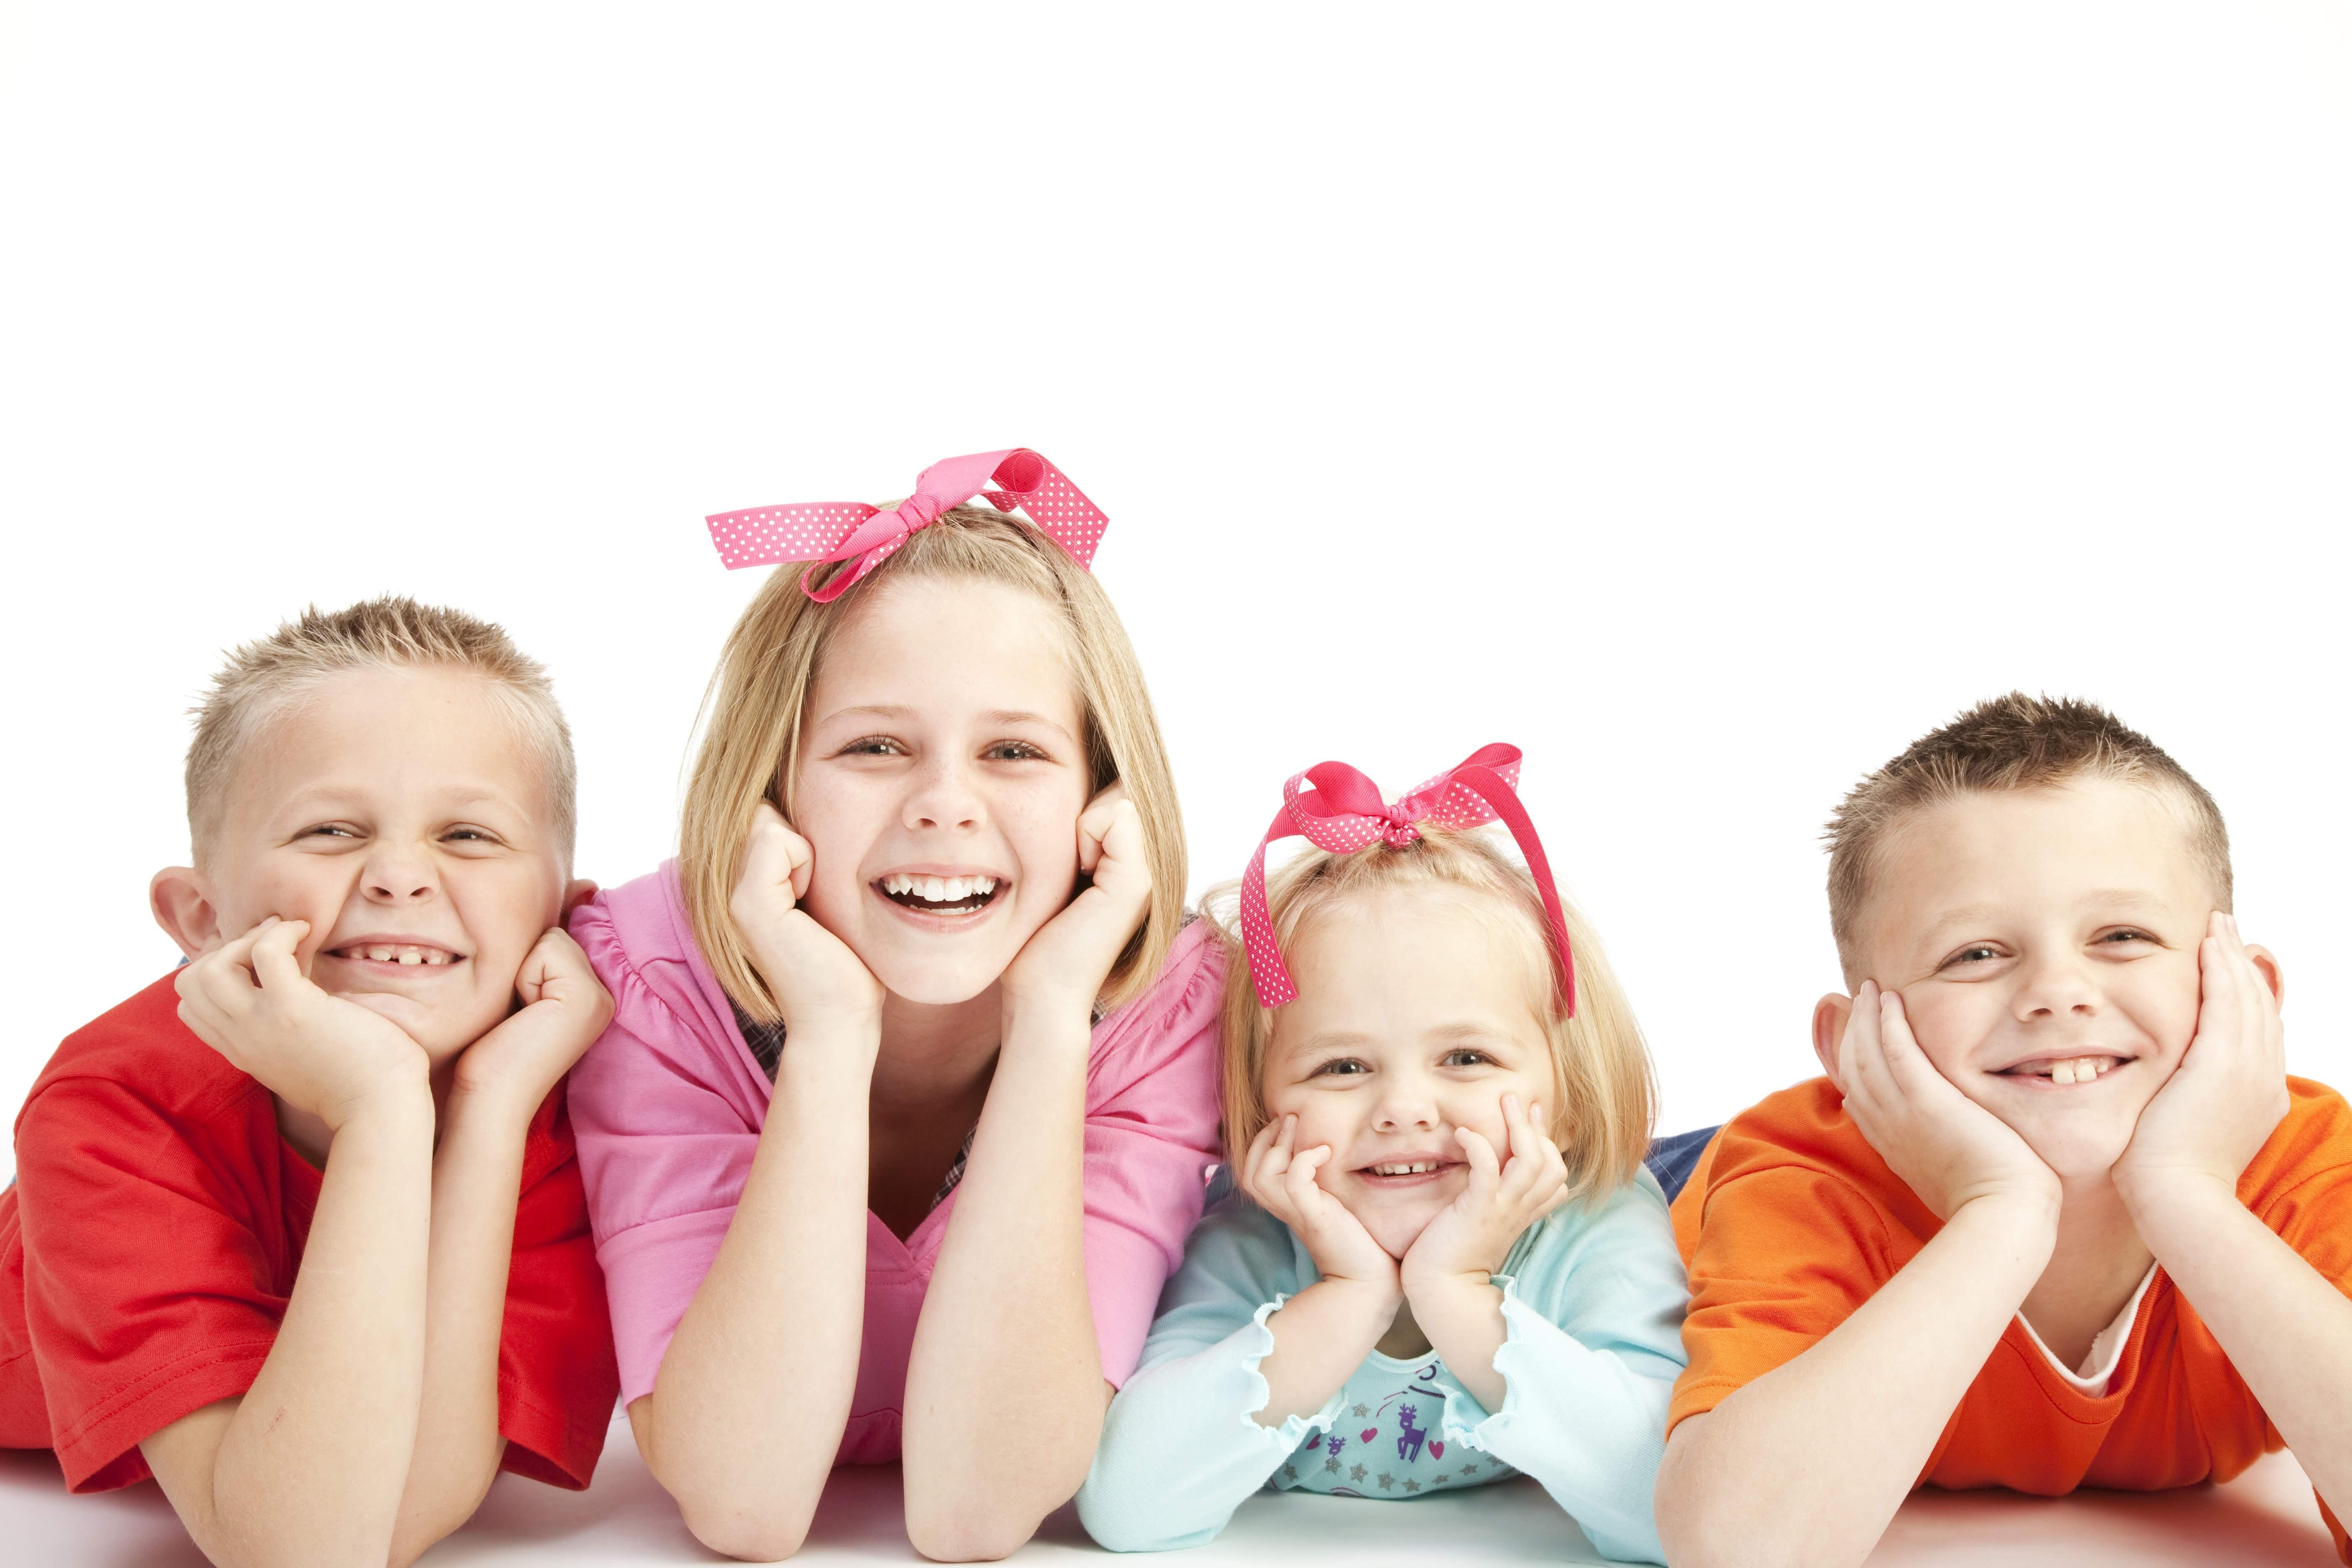 5616x3744 0.785 MB. Kids Wallpaper - Children HD PNG